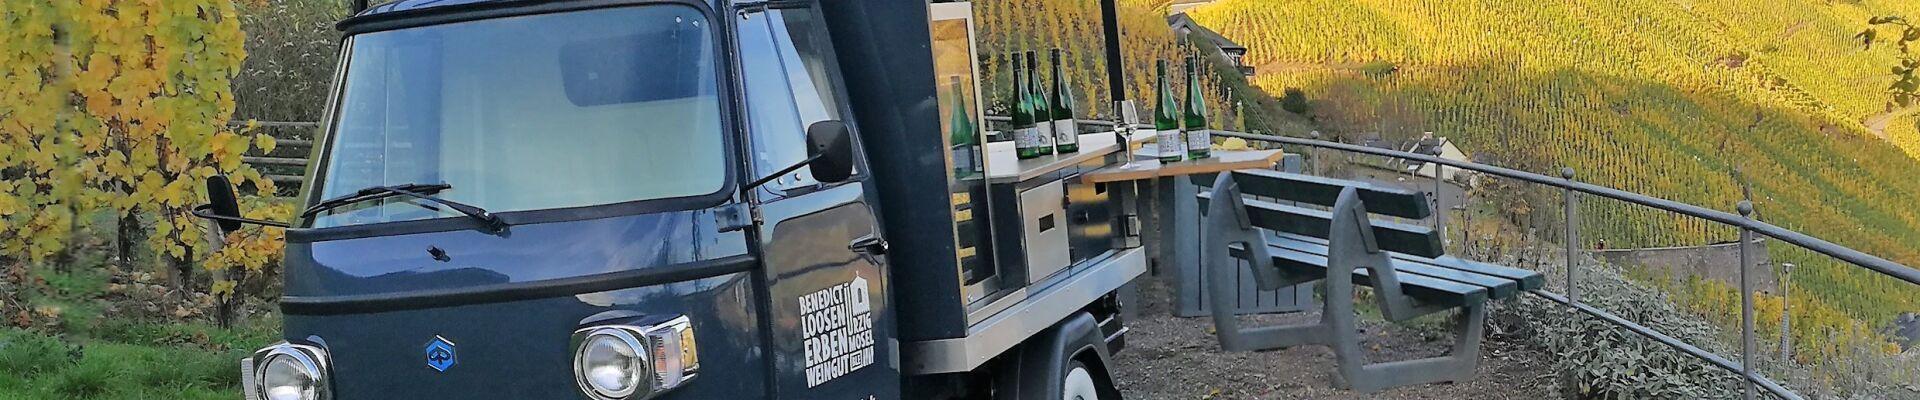 Weinprobe an der mobilen Vinothek mit dem WeinGut Benedict Loosen Erben